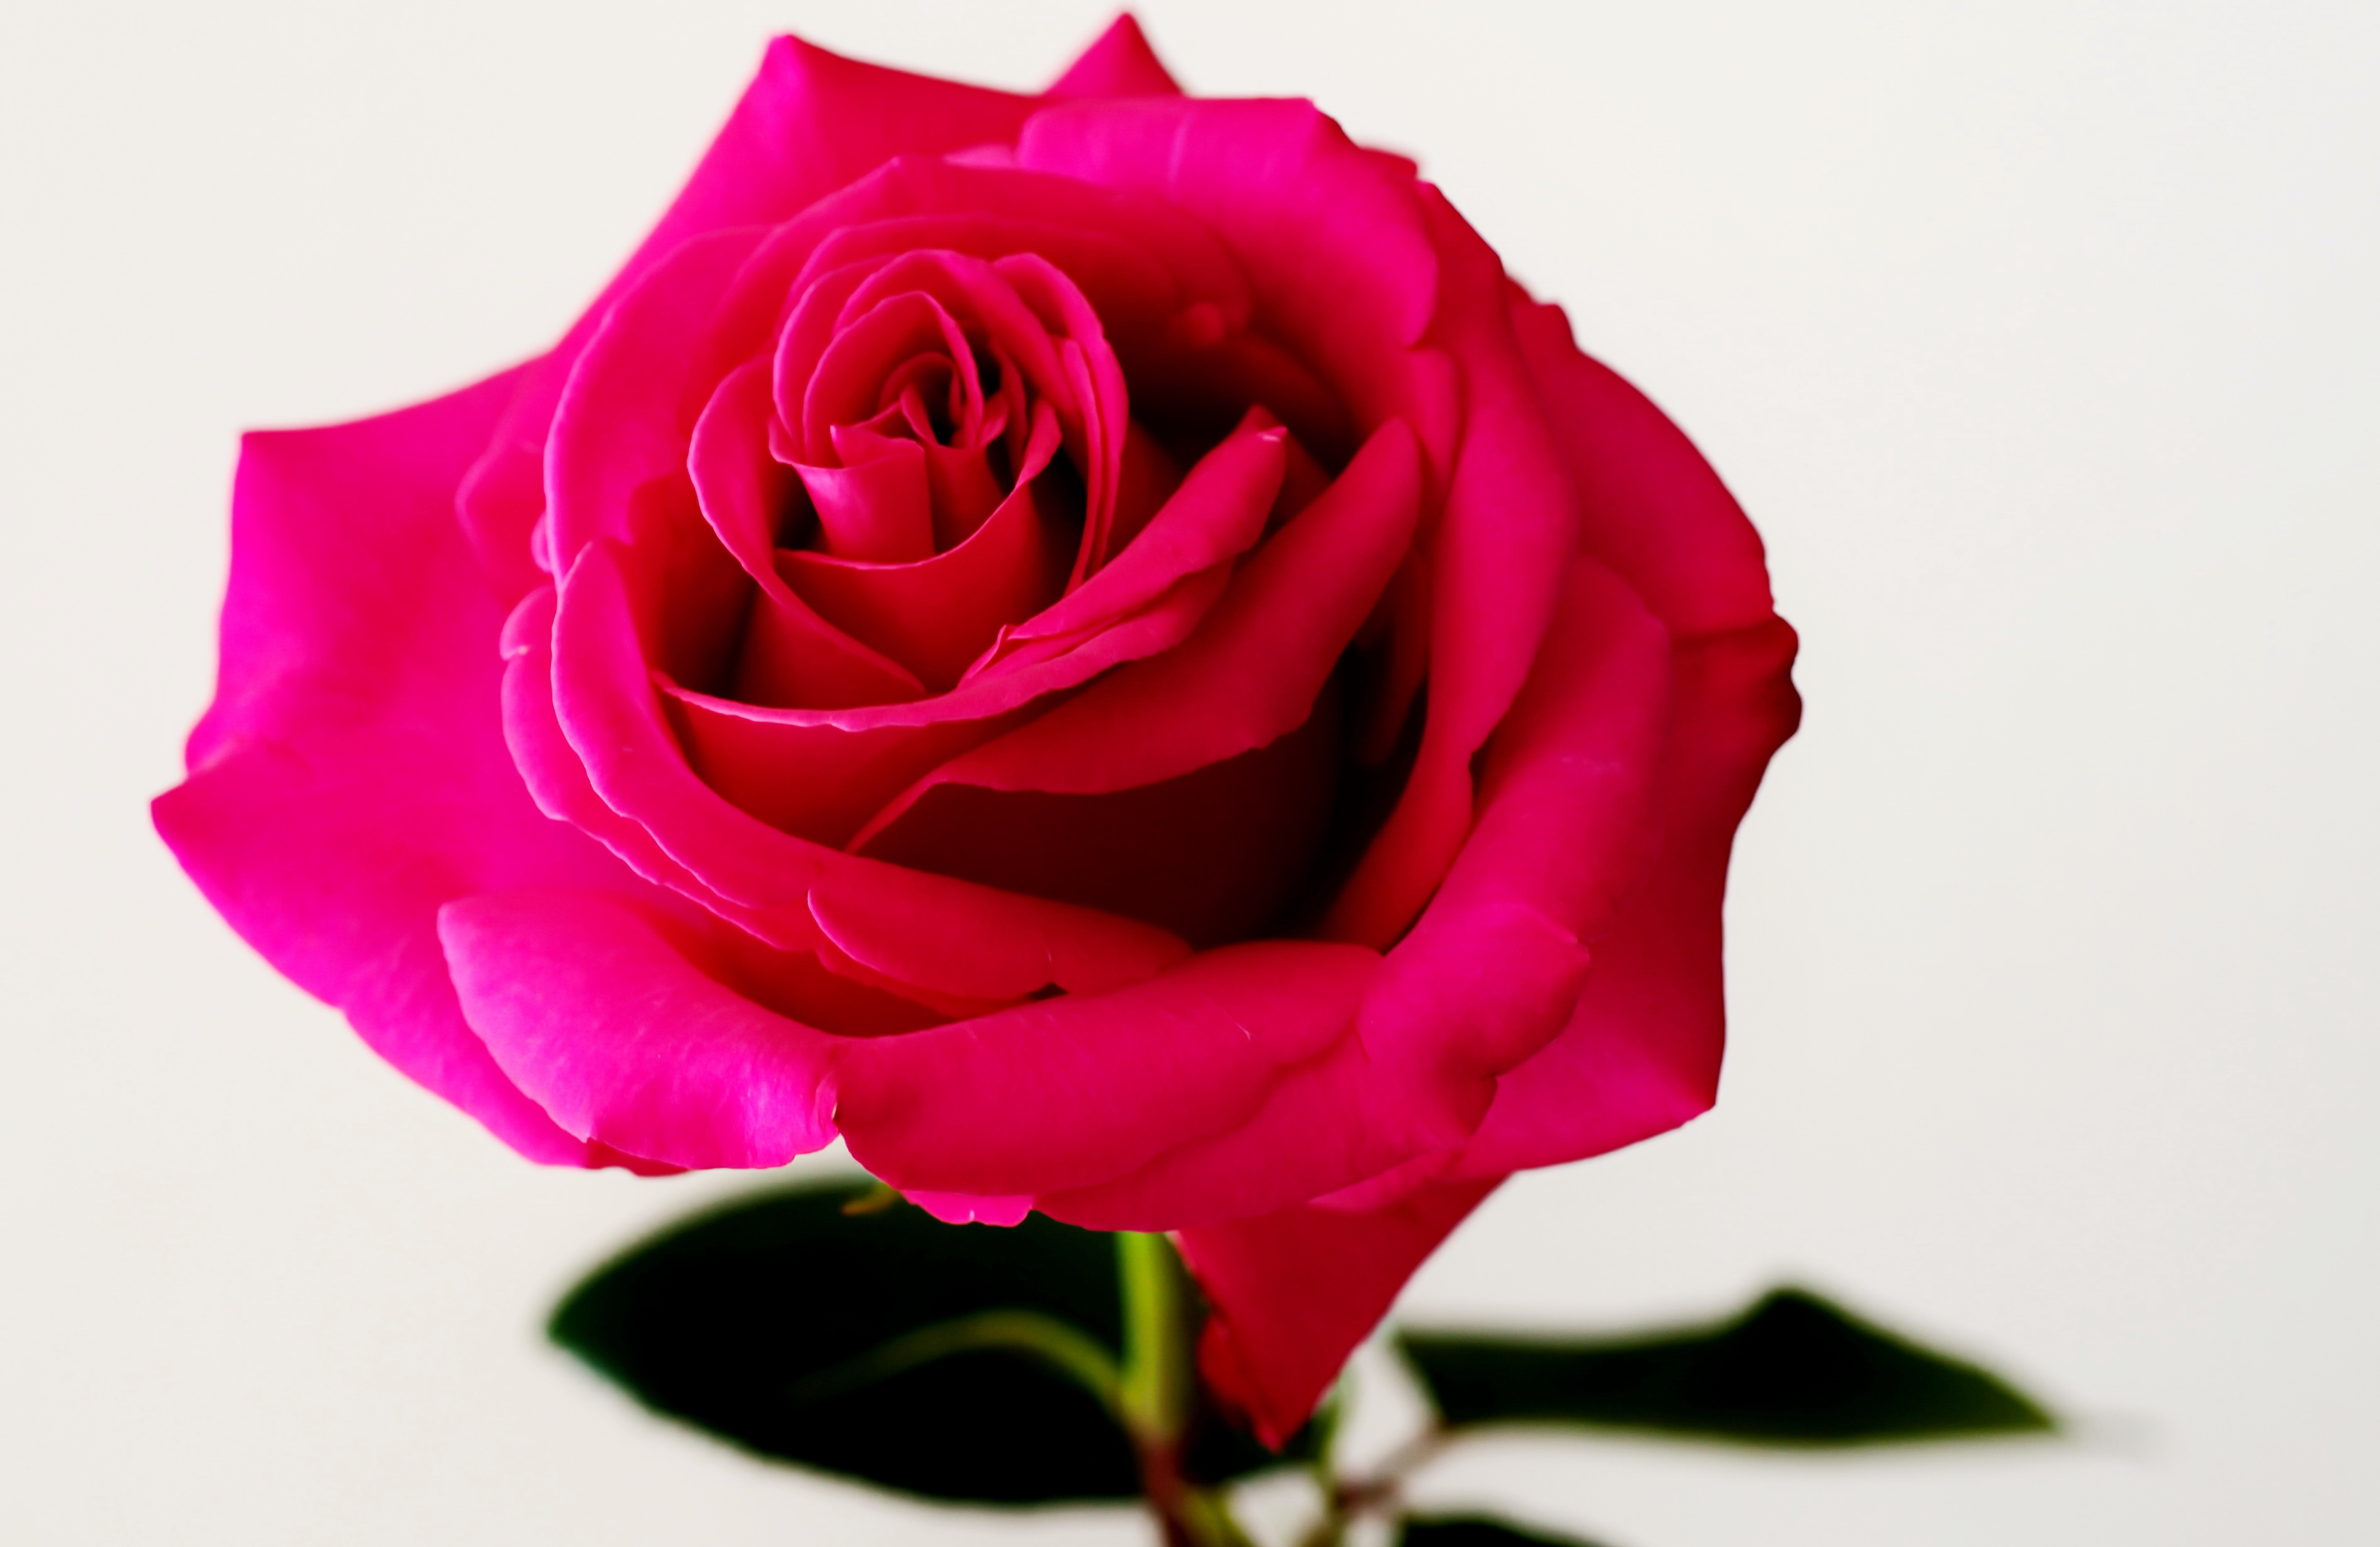 La reine des fleurs ? 217546reinedesfleurs2D300f4160s60mmISO200